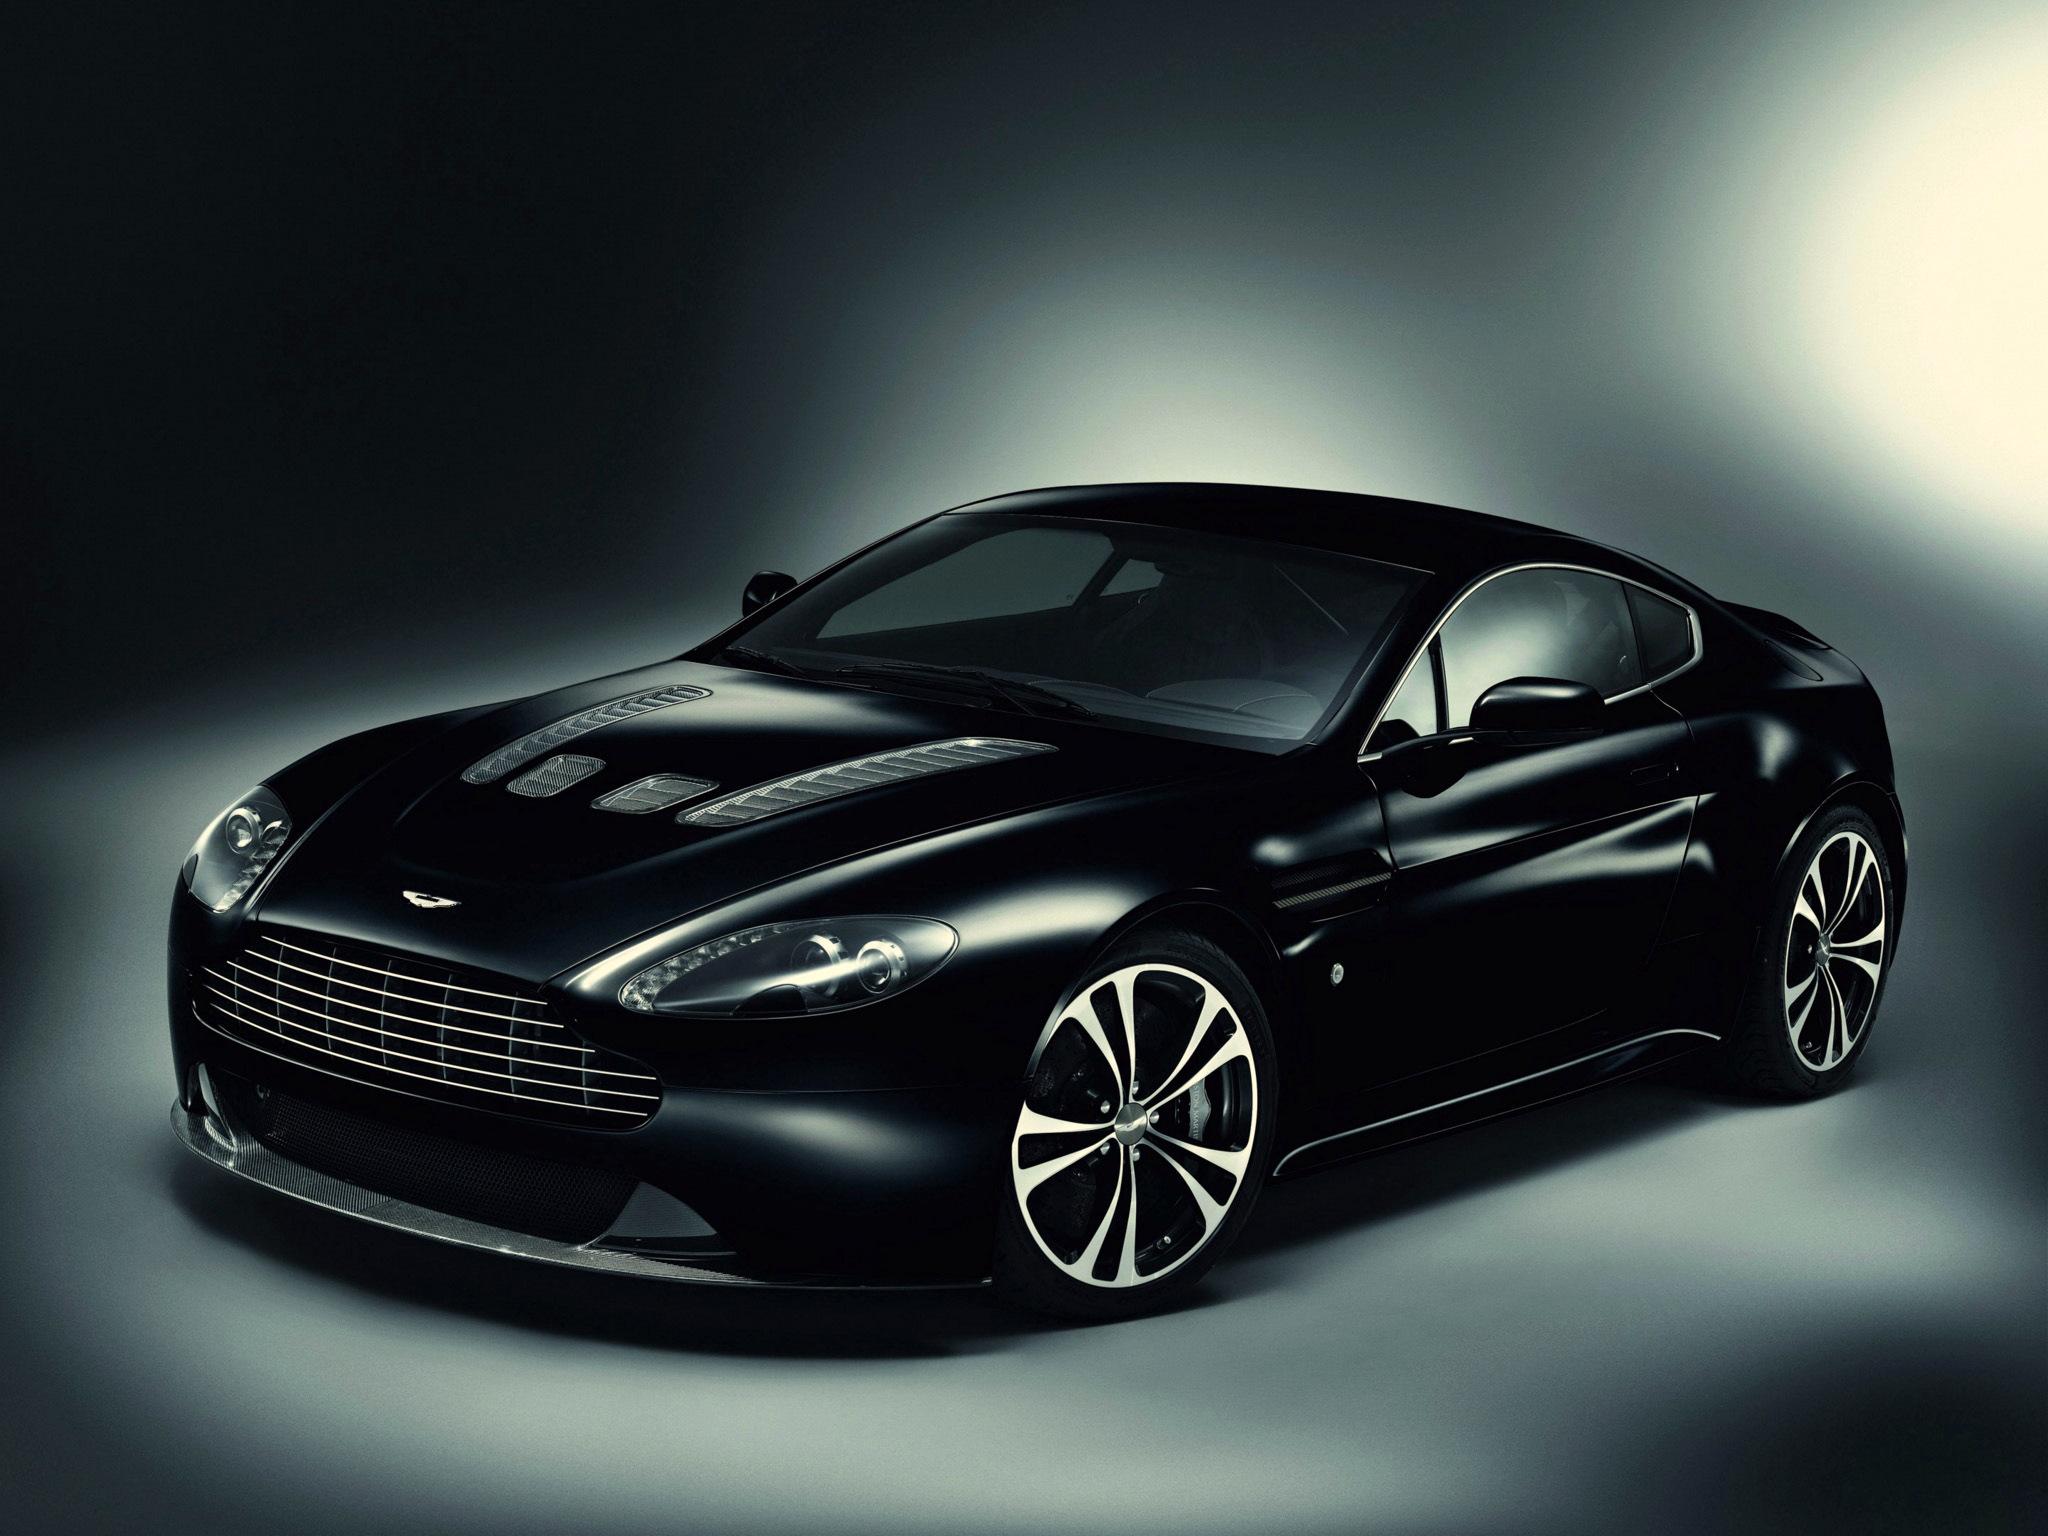 Aston Martin black скачать